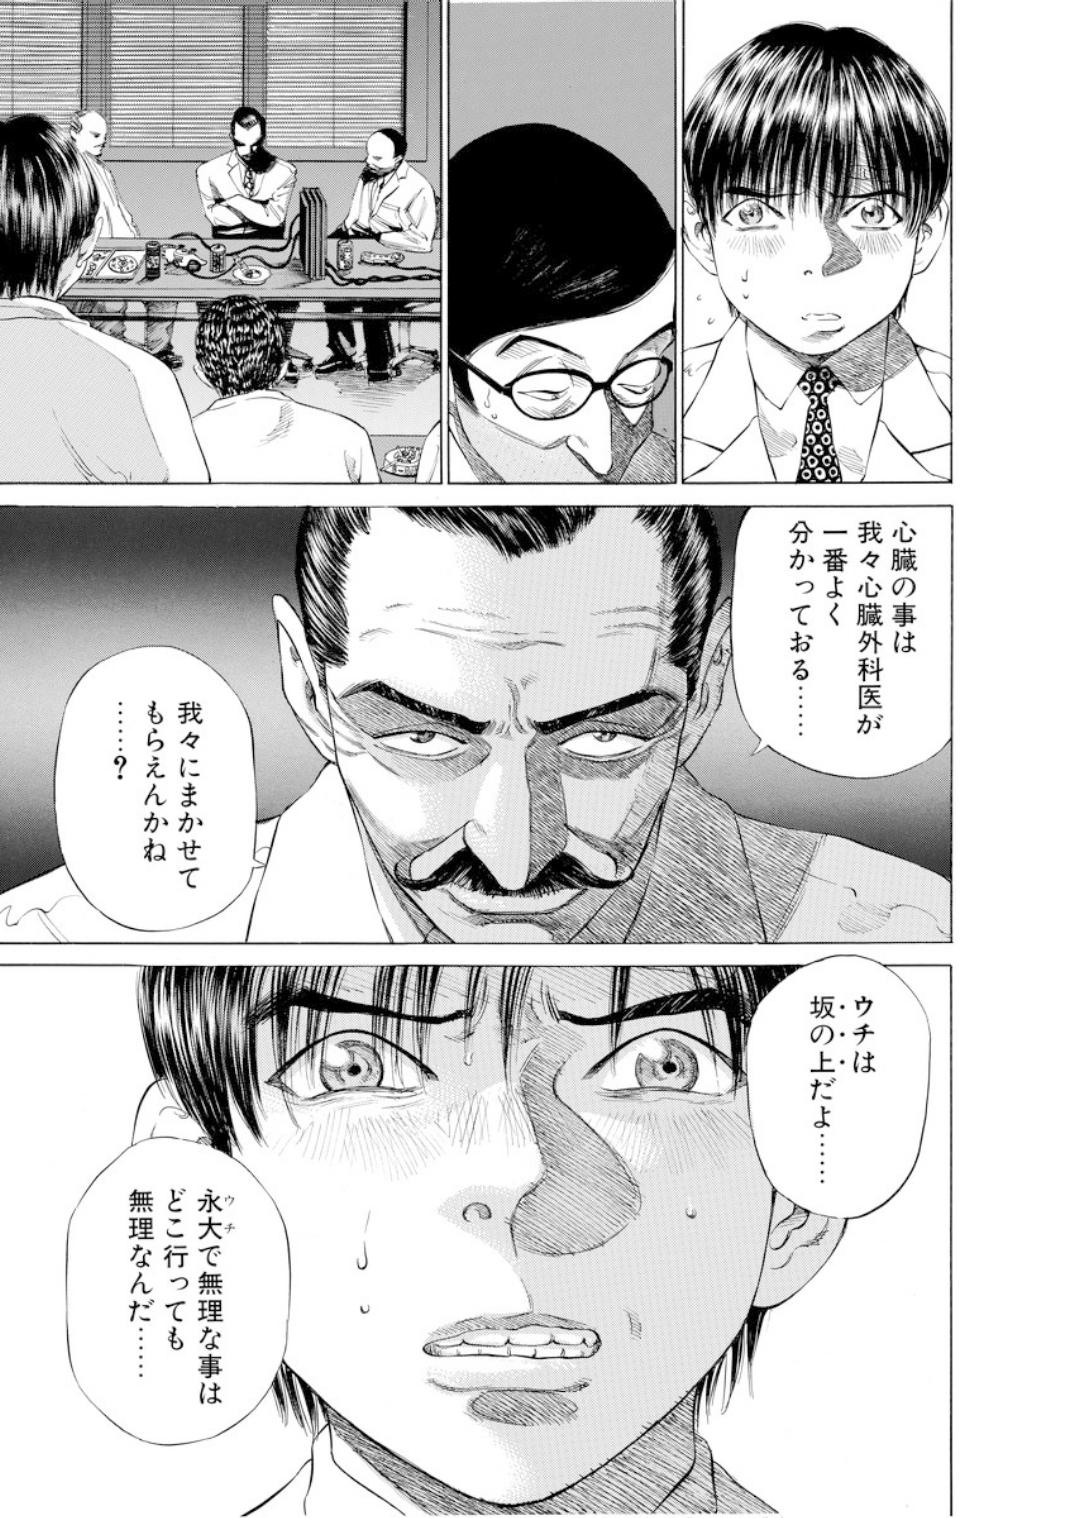 001bj_page-0199.jpg